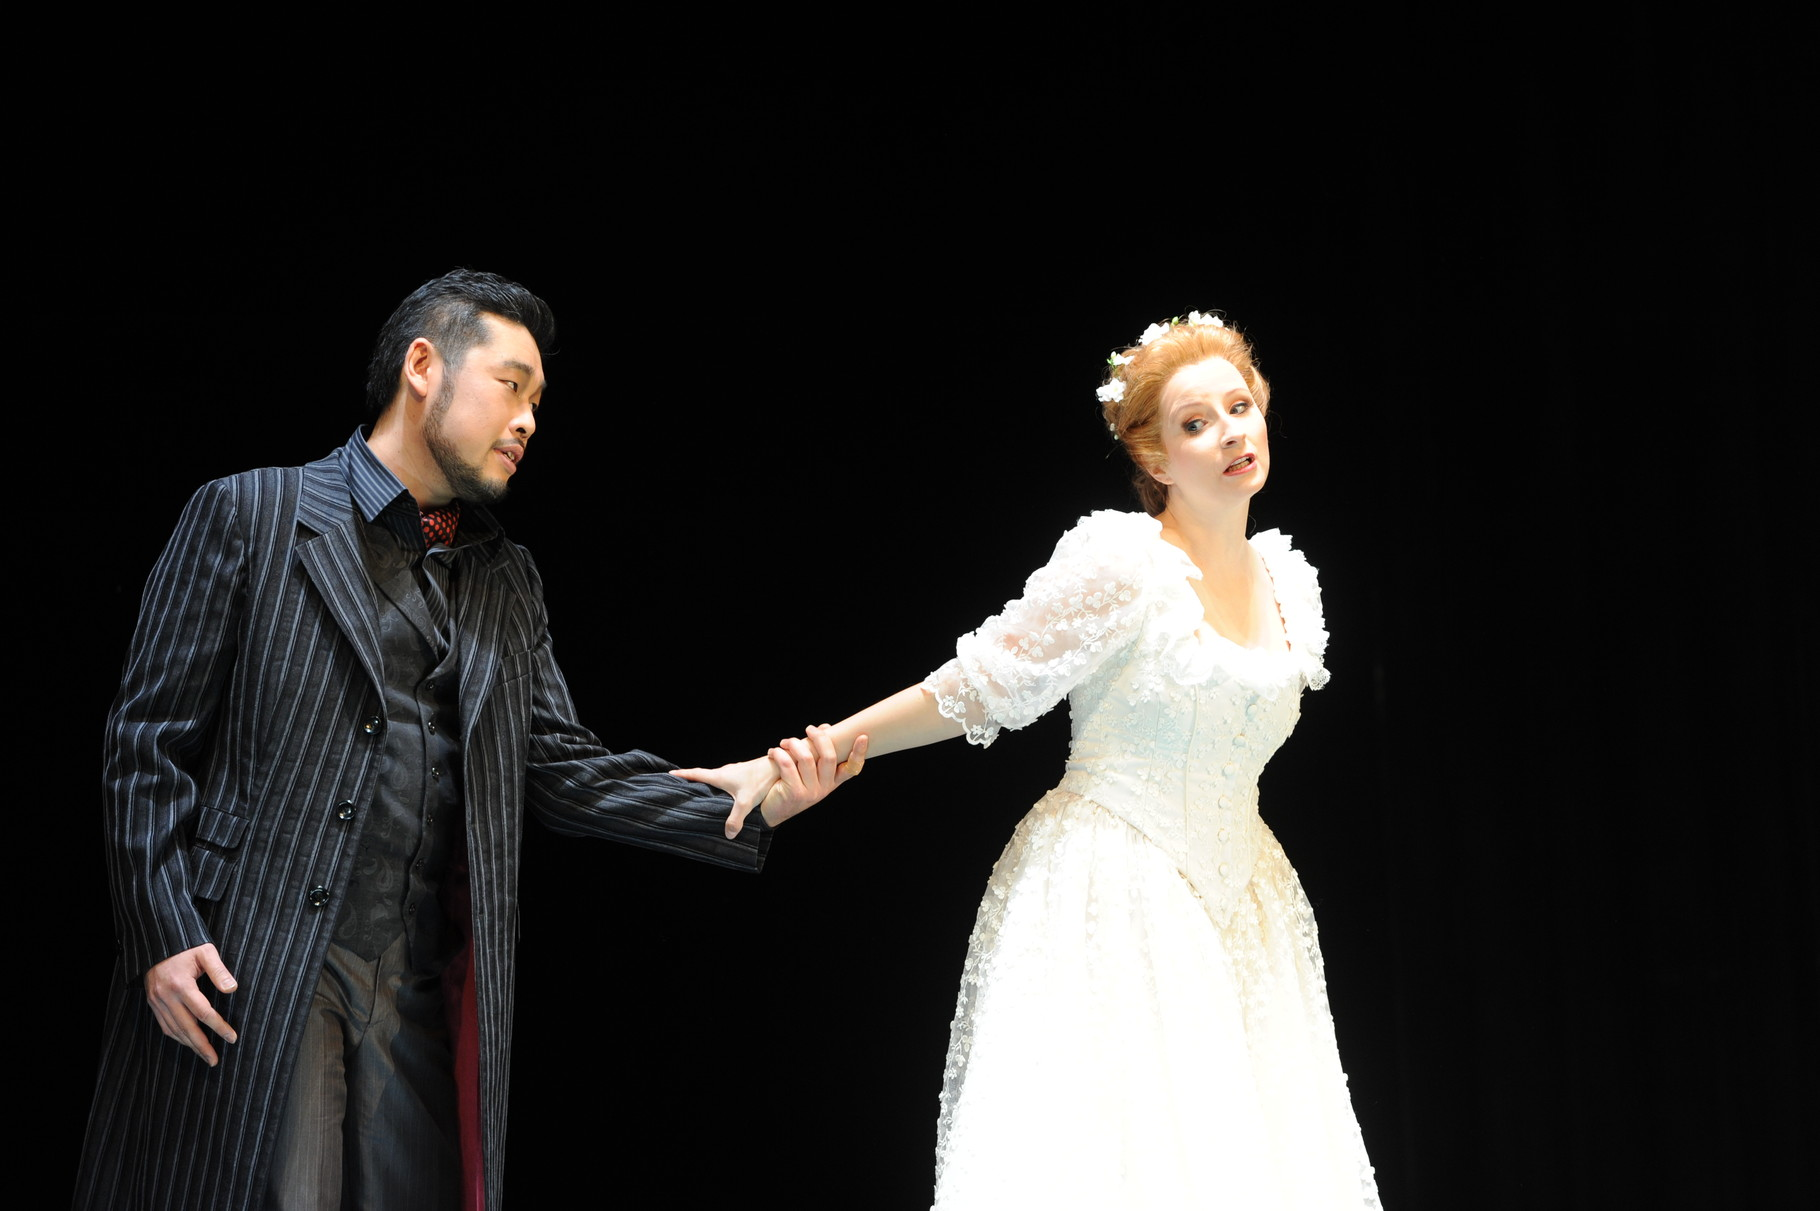 Zerlina - Don Giovanni - 2012/13 am Stadttheater Bremerhaven - Kostüm: Johannes Haufe, Maske: Henrik Pecher